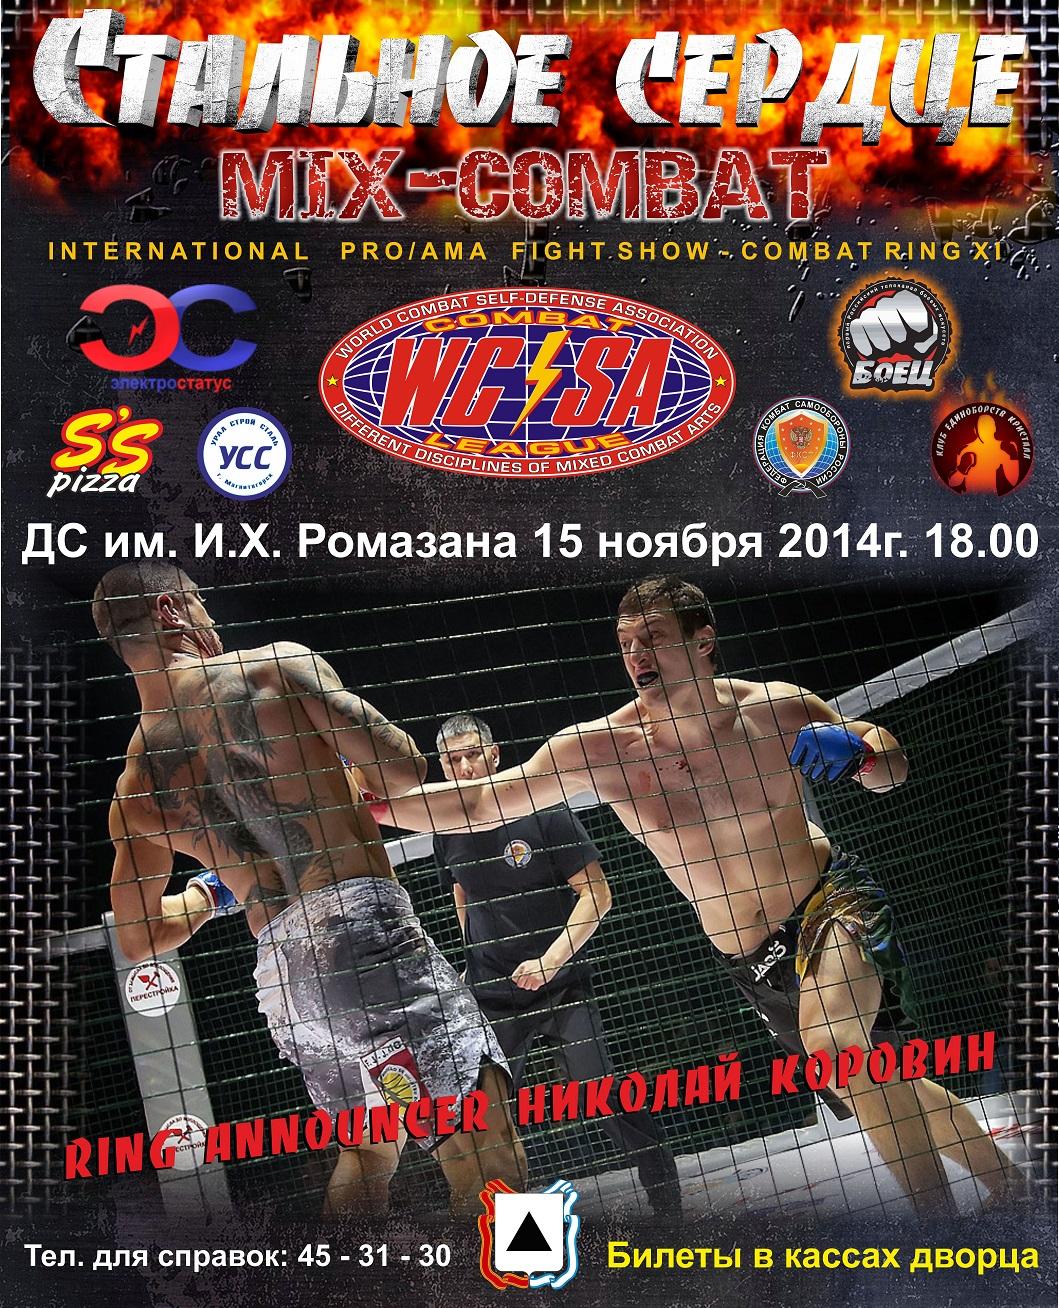 http://www.combatsd.ru/images/upload/Афиша%20ринг%2011.jpg